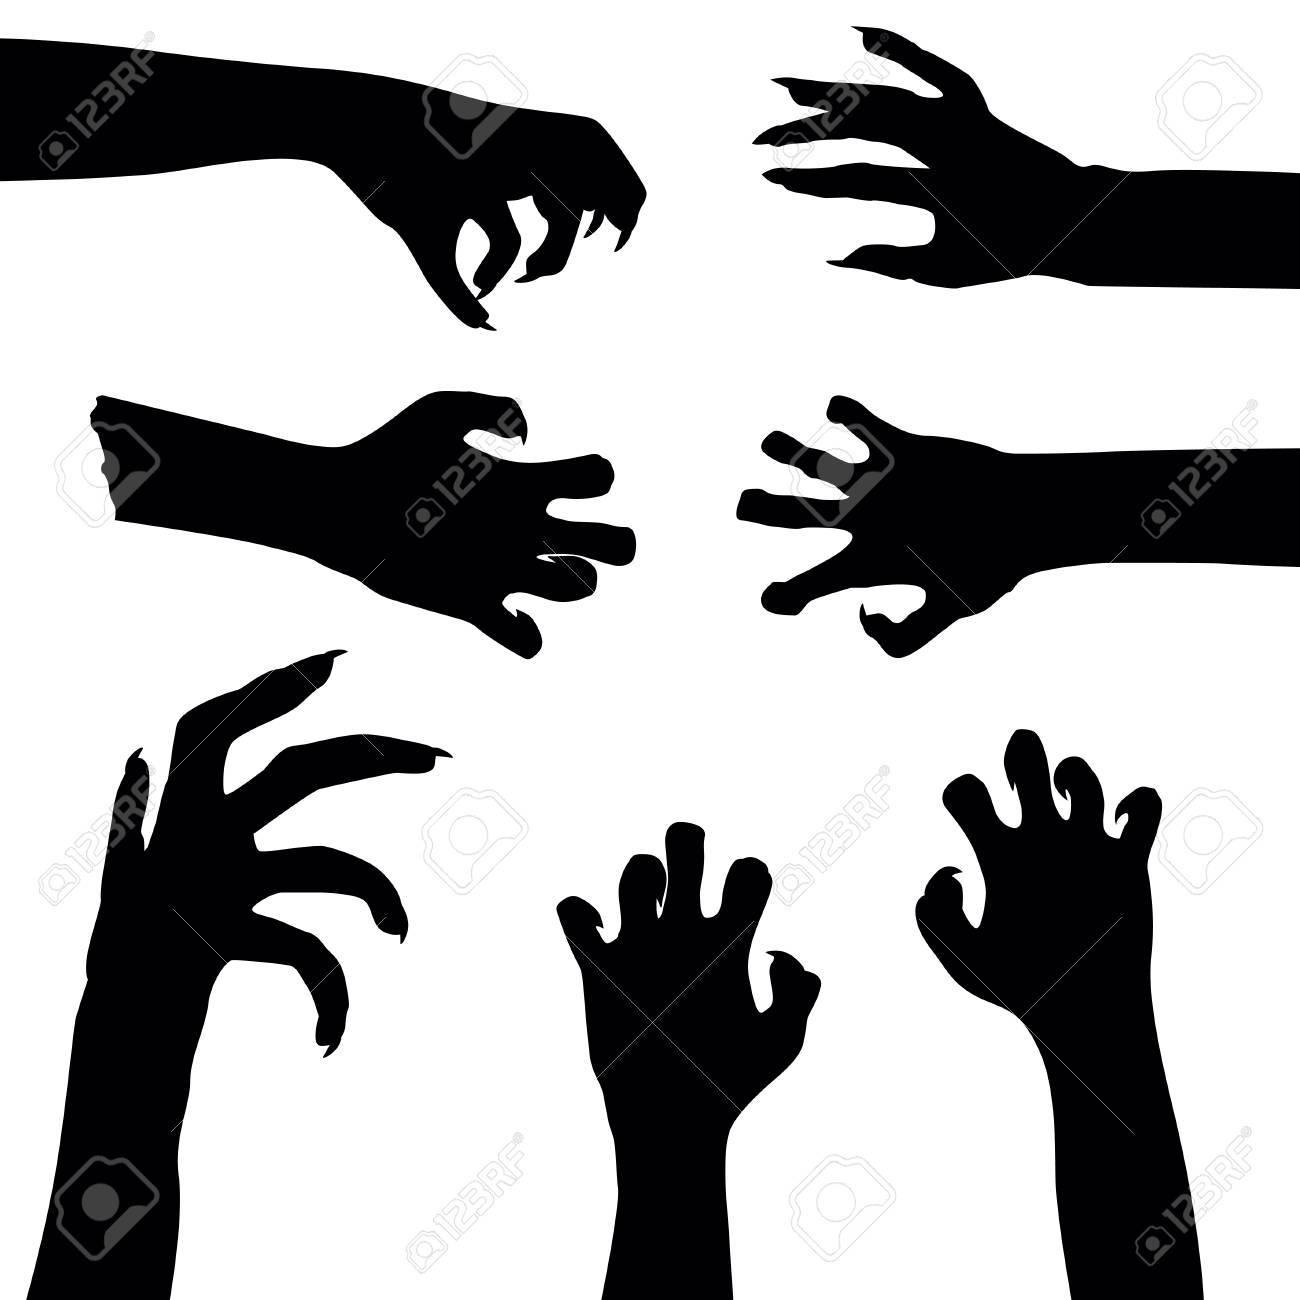 Set of zombie hands isolated on white background, illustration - 62197422